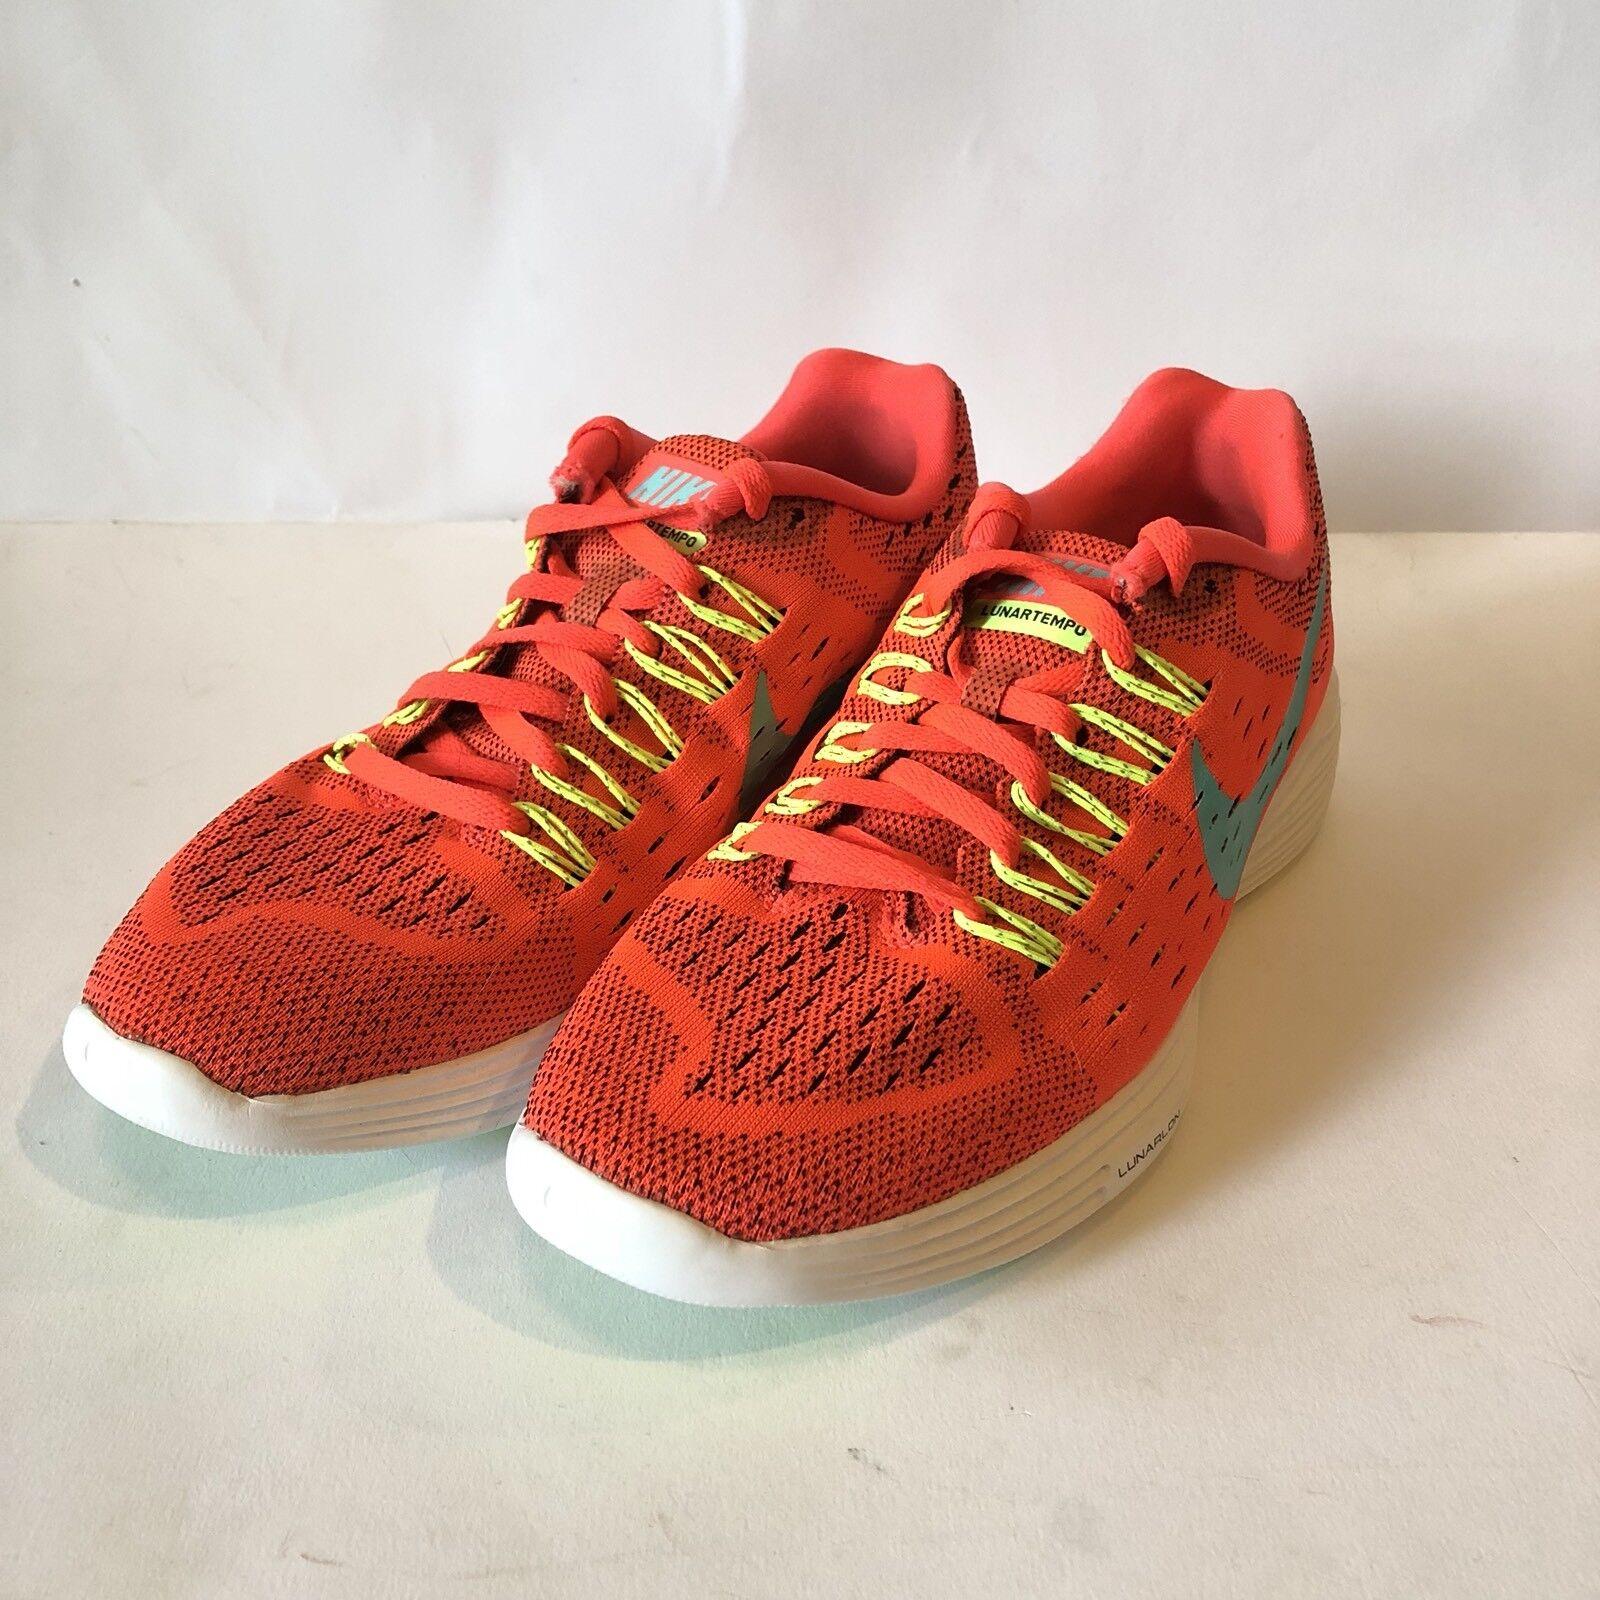 Nike Lunartempo Womens Size 6.5, Orange